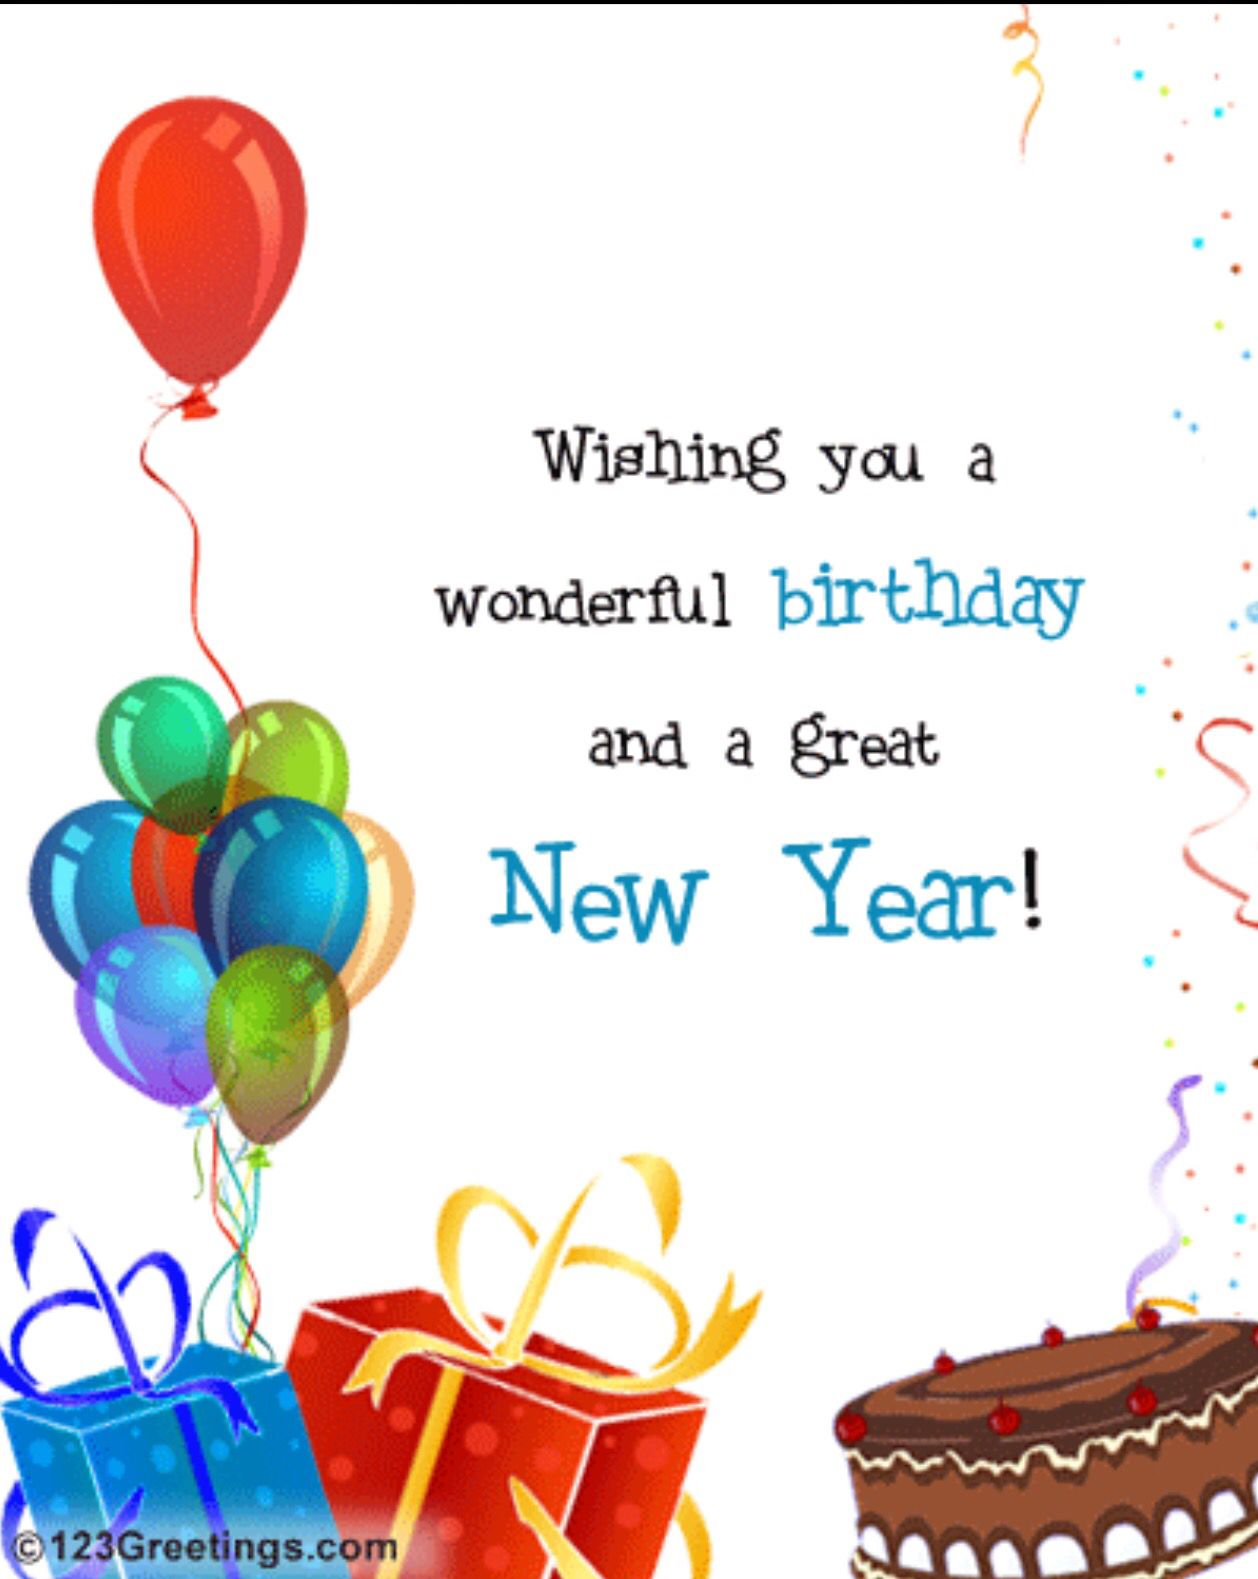 ️🎉 Happy birthday cards, Birthday jokes, New year wishes